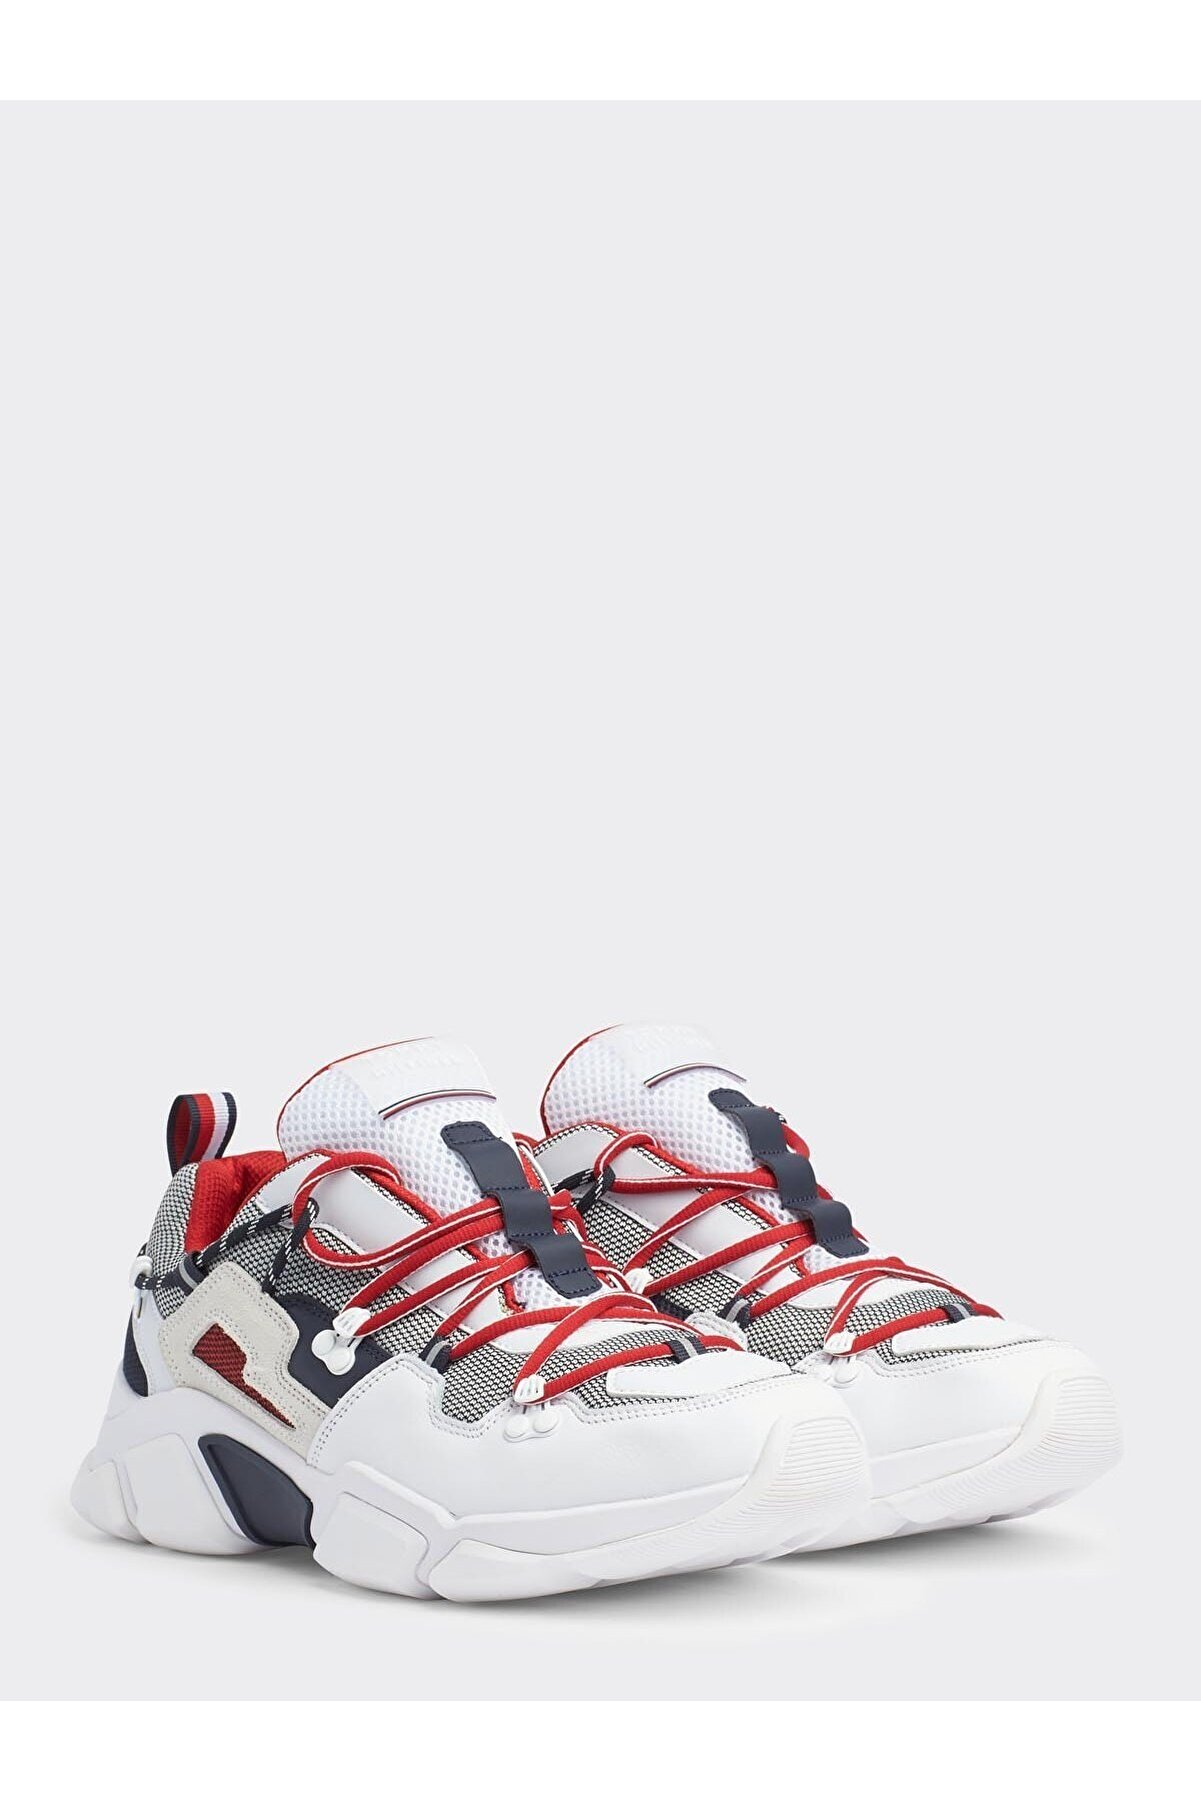 Tommy Hilfiger Cıty Voyager Chunky Sneaker